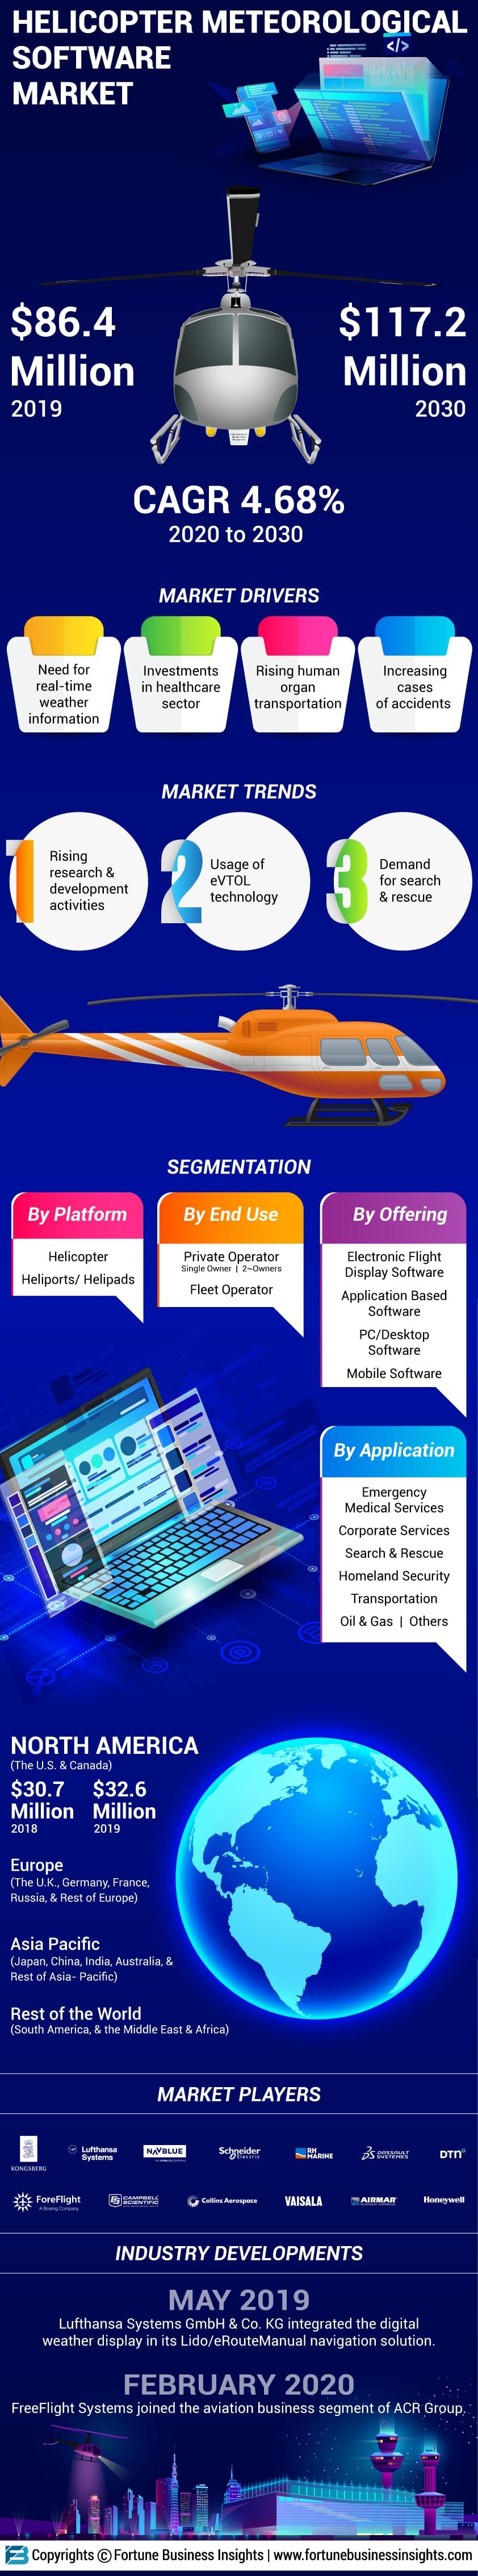 Helicopter Meteorological Software Market